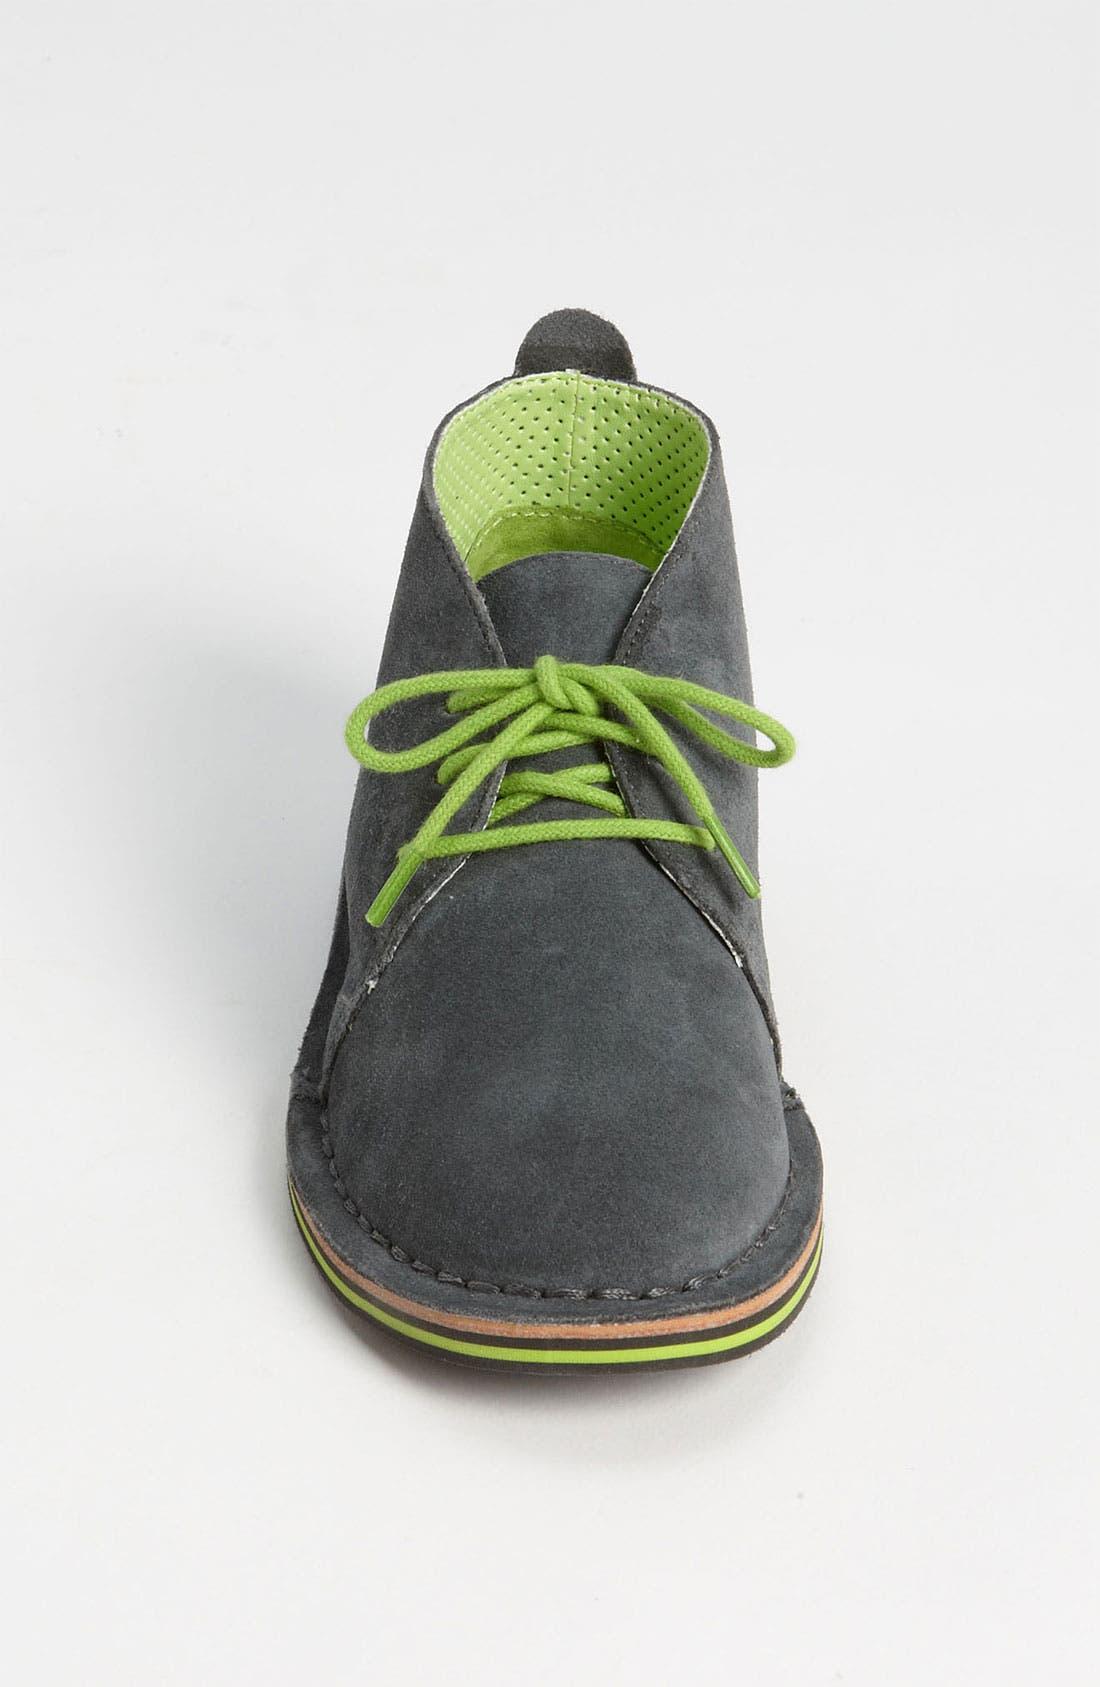 Alternate Image 3  - Cole Haan 'Air Paul - Stripe' Chukka Boot (Toddler, Little Kid & Big Kid)